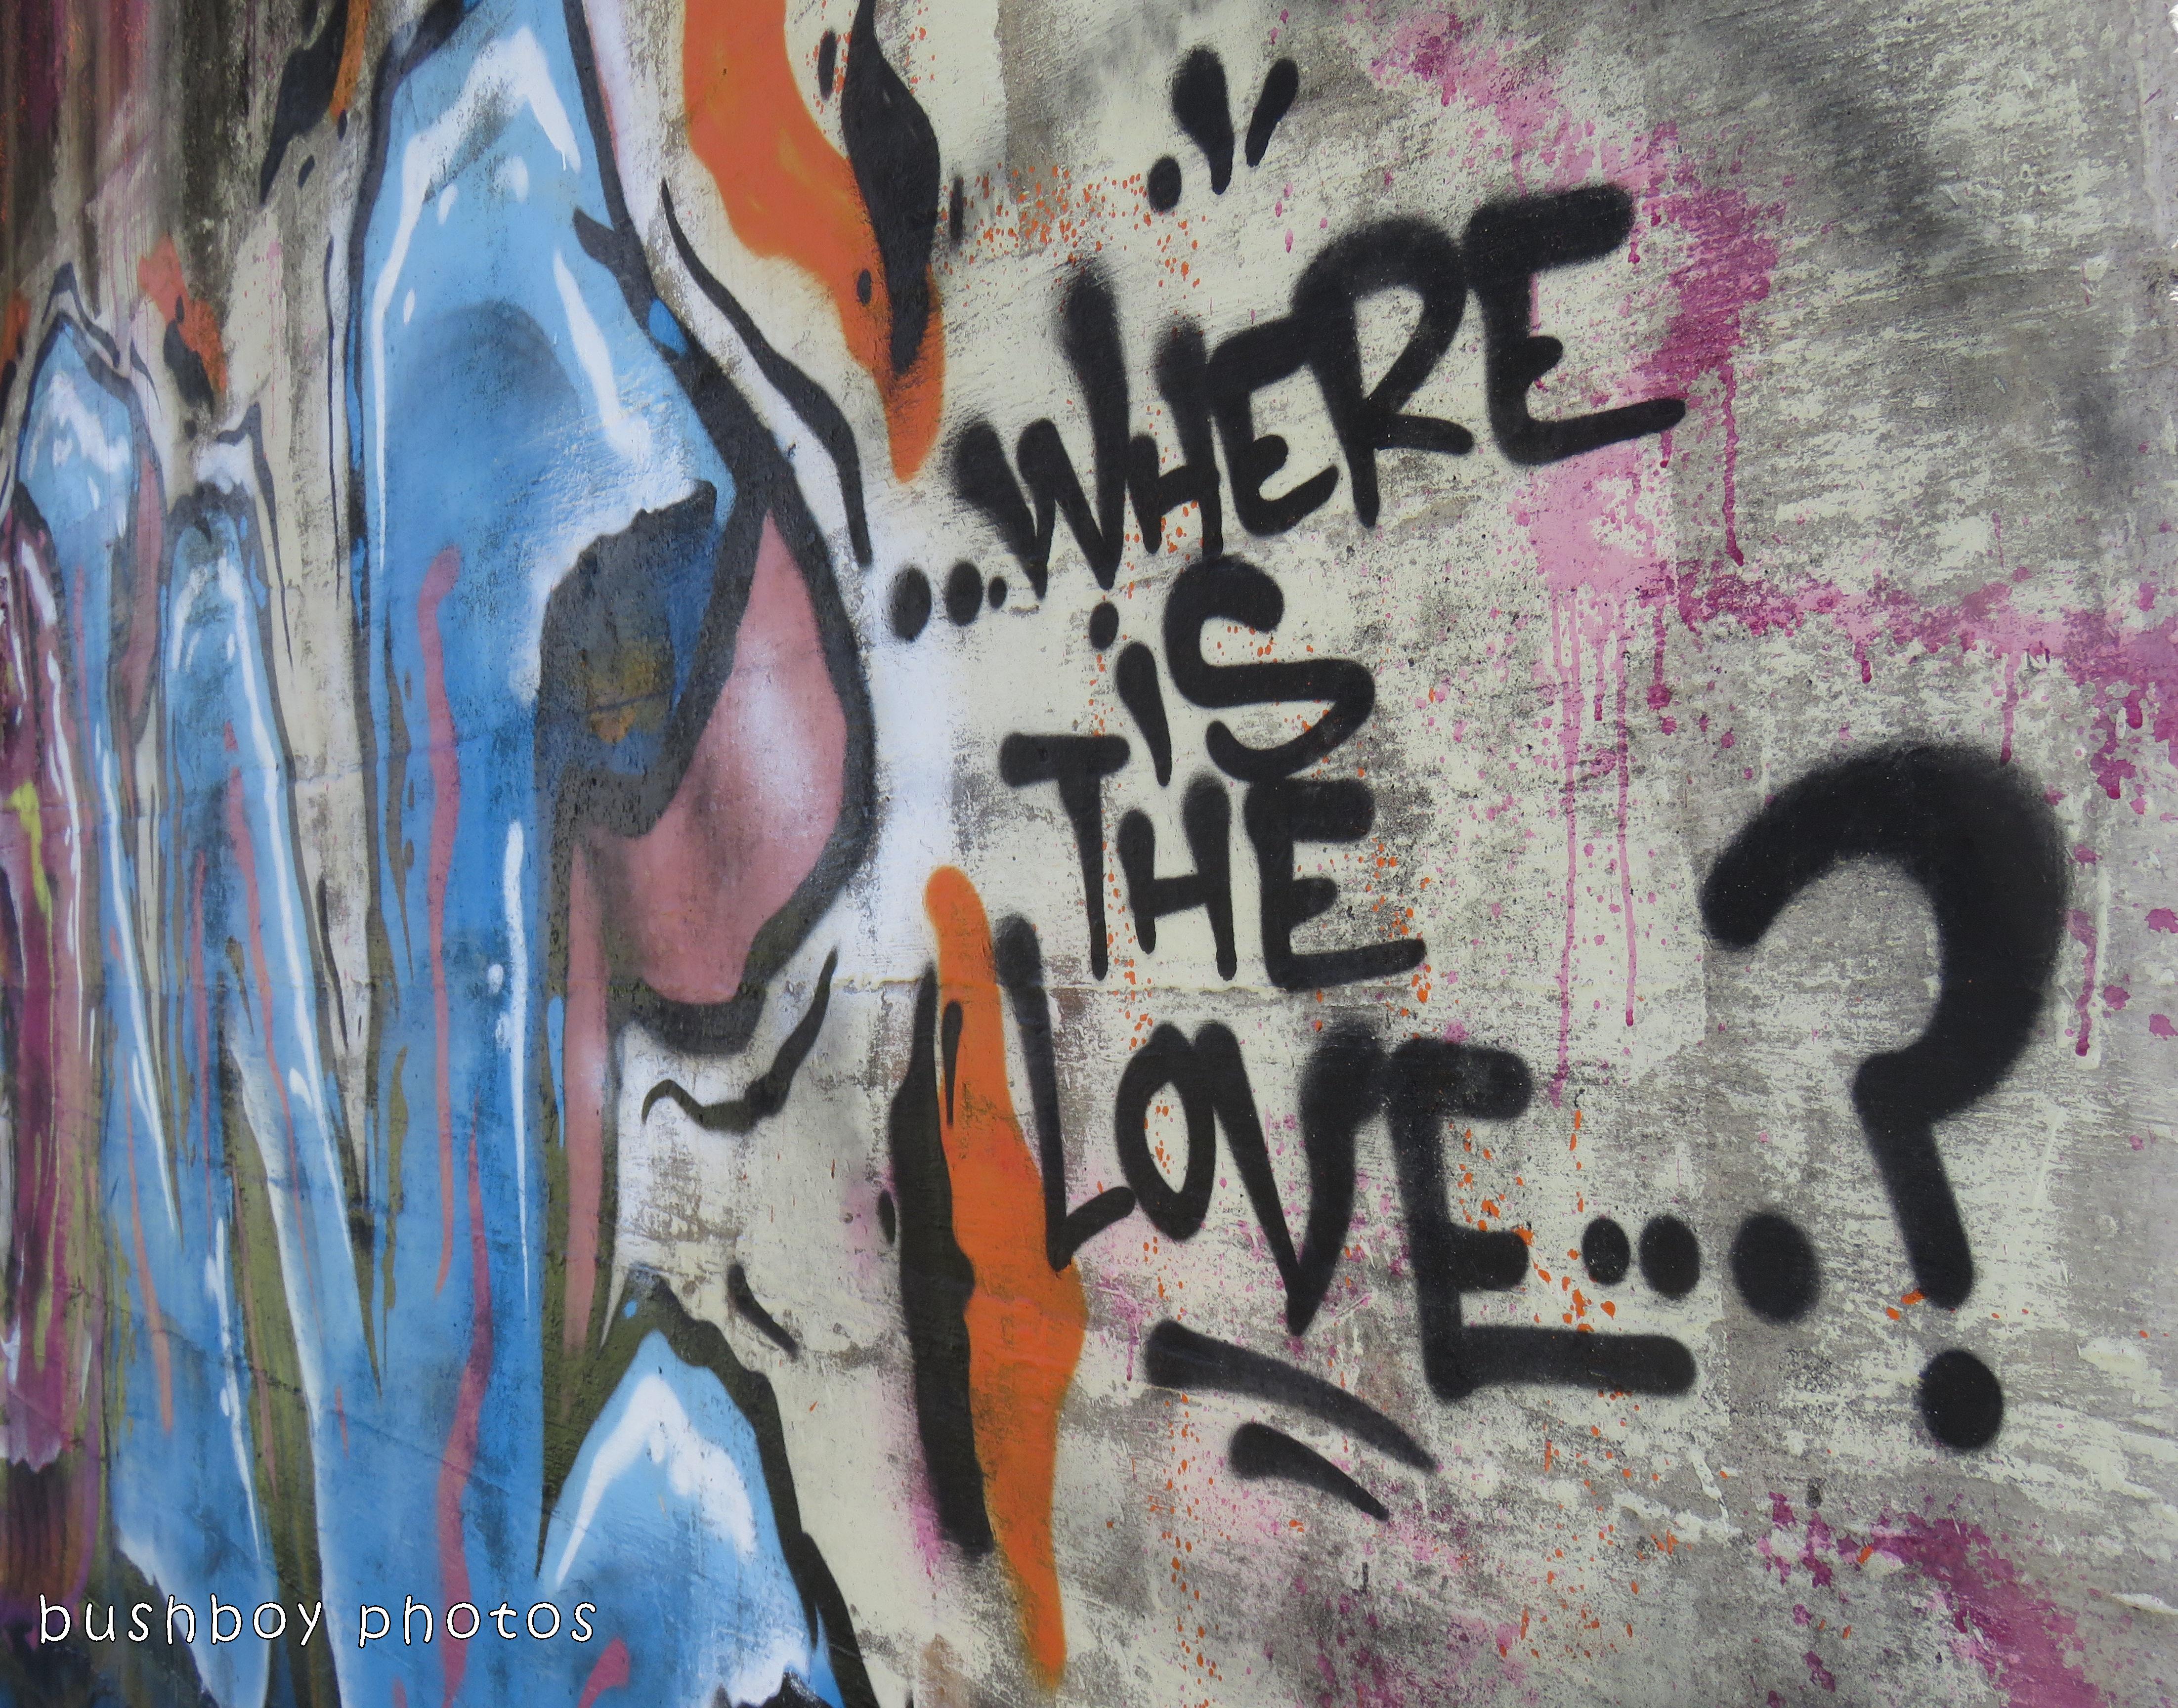 171205_blog challange_message_grafitti_grafton